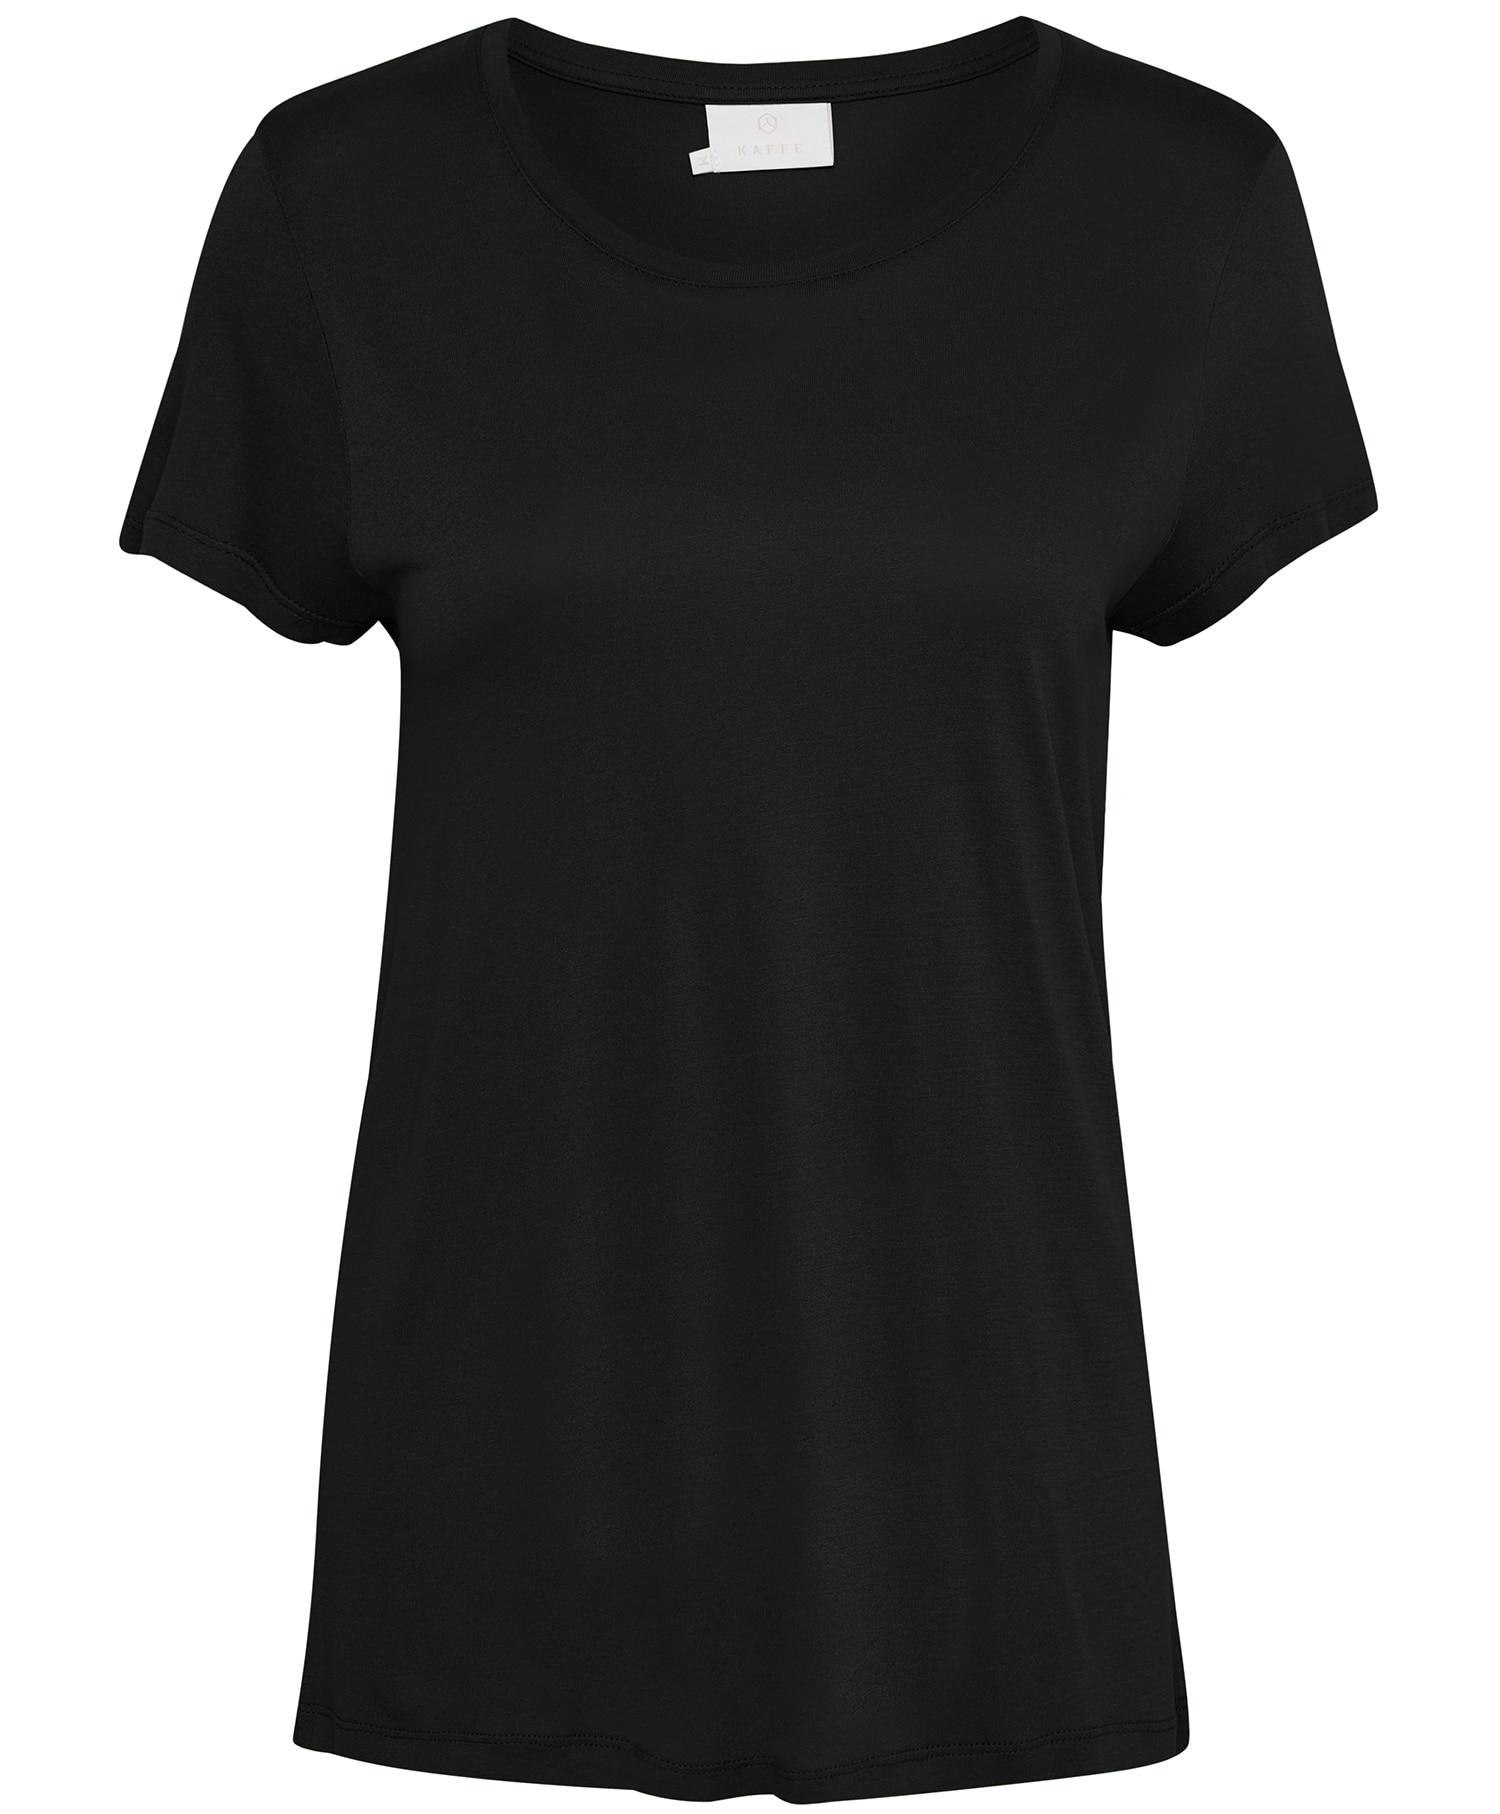 Kaffe Anna t-skjorte